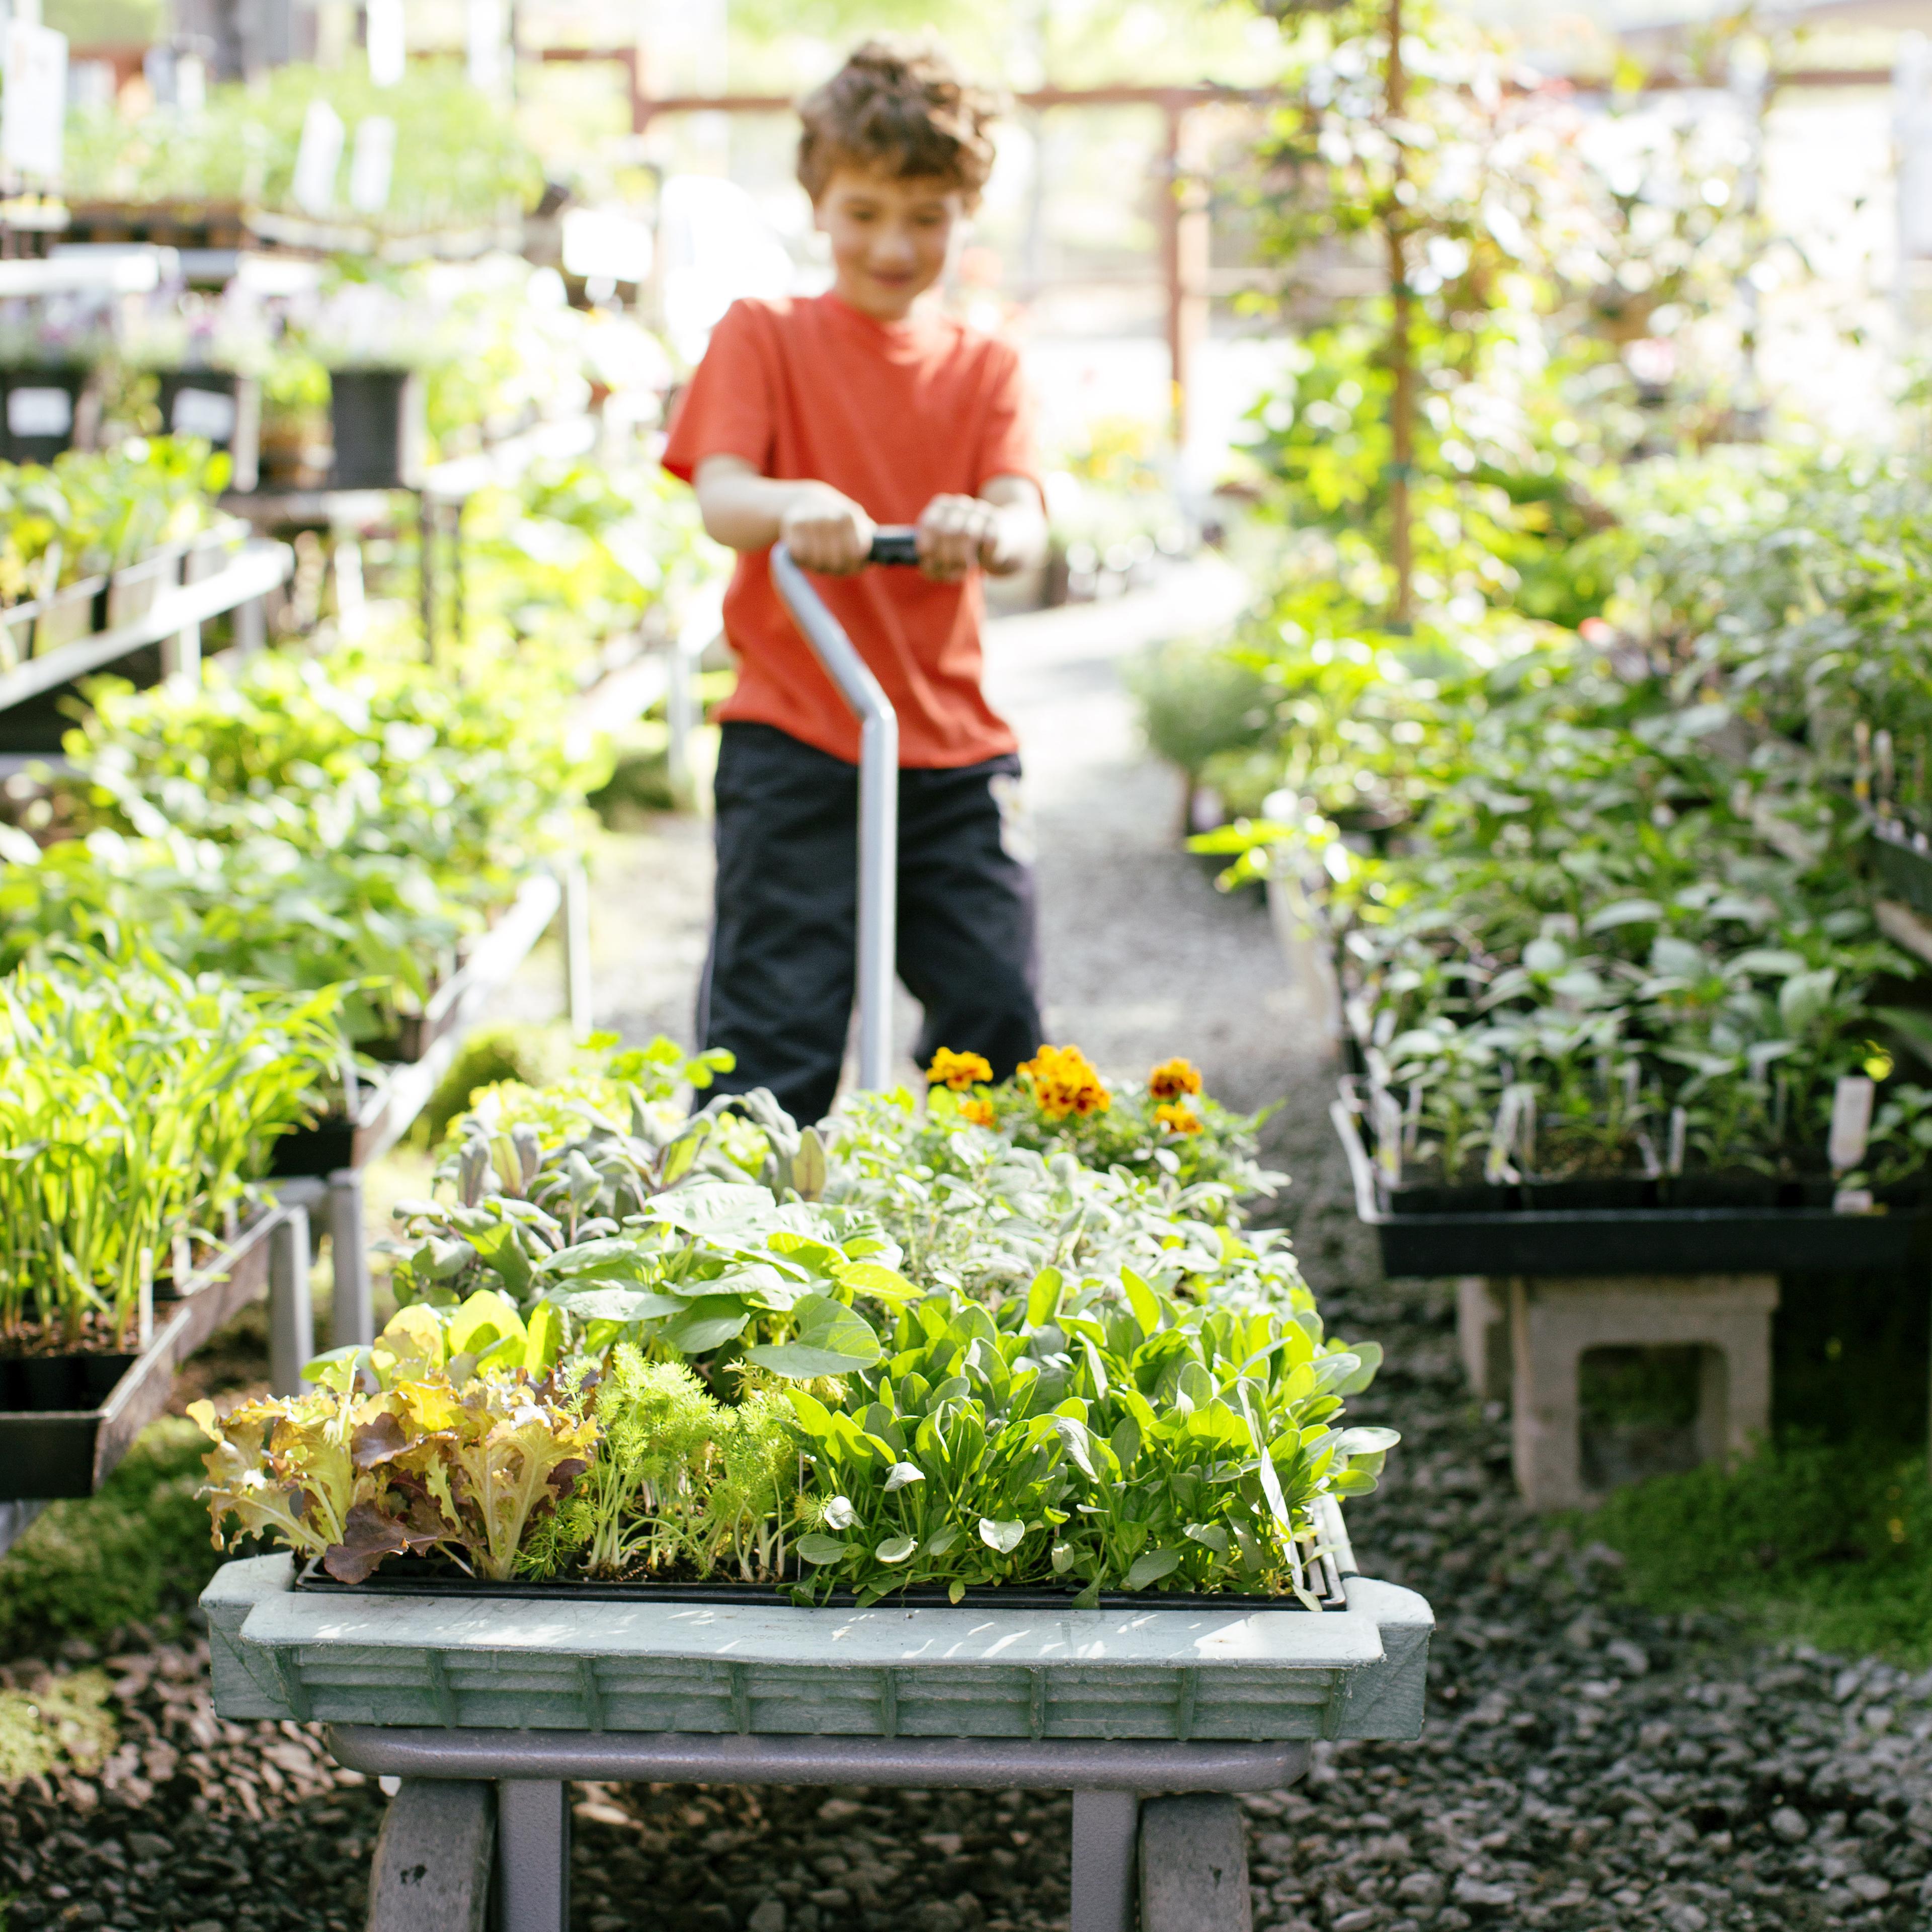 How To Create A Children's Garden